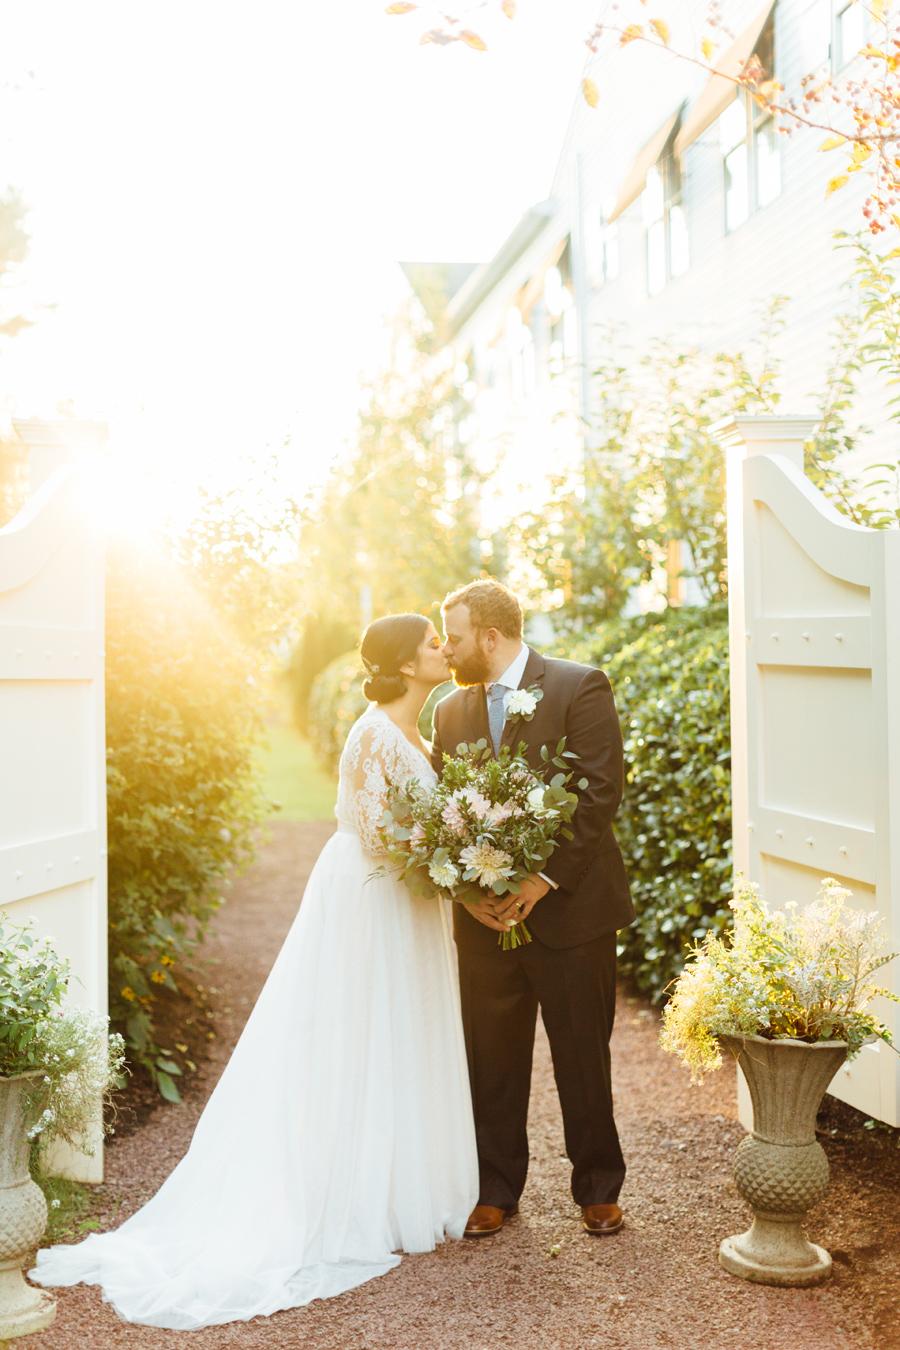 the-inn-at-leola-wedding-lancaster-pennsylvania-wedding-photographer-rebeka-viola-photograhy (89).jpg